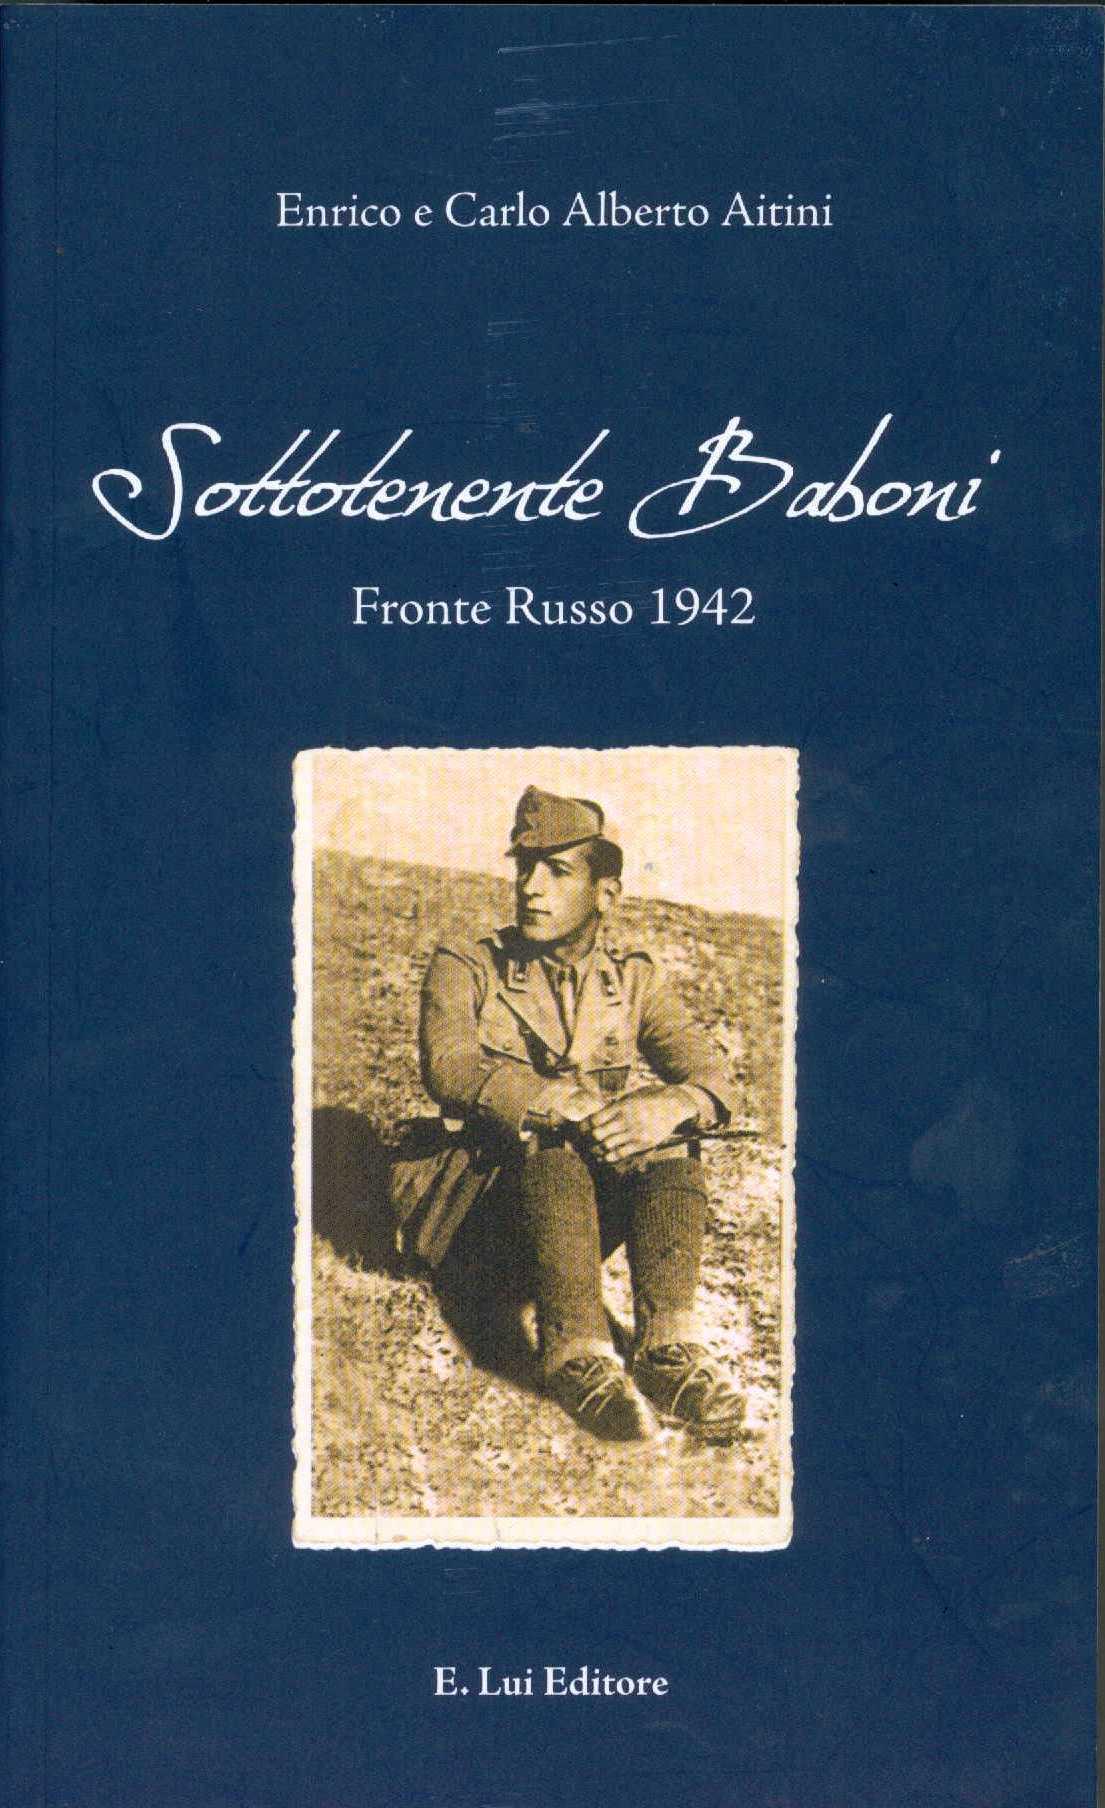 Sottotenente Baboni